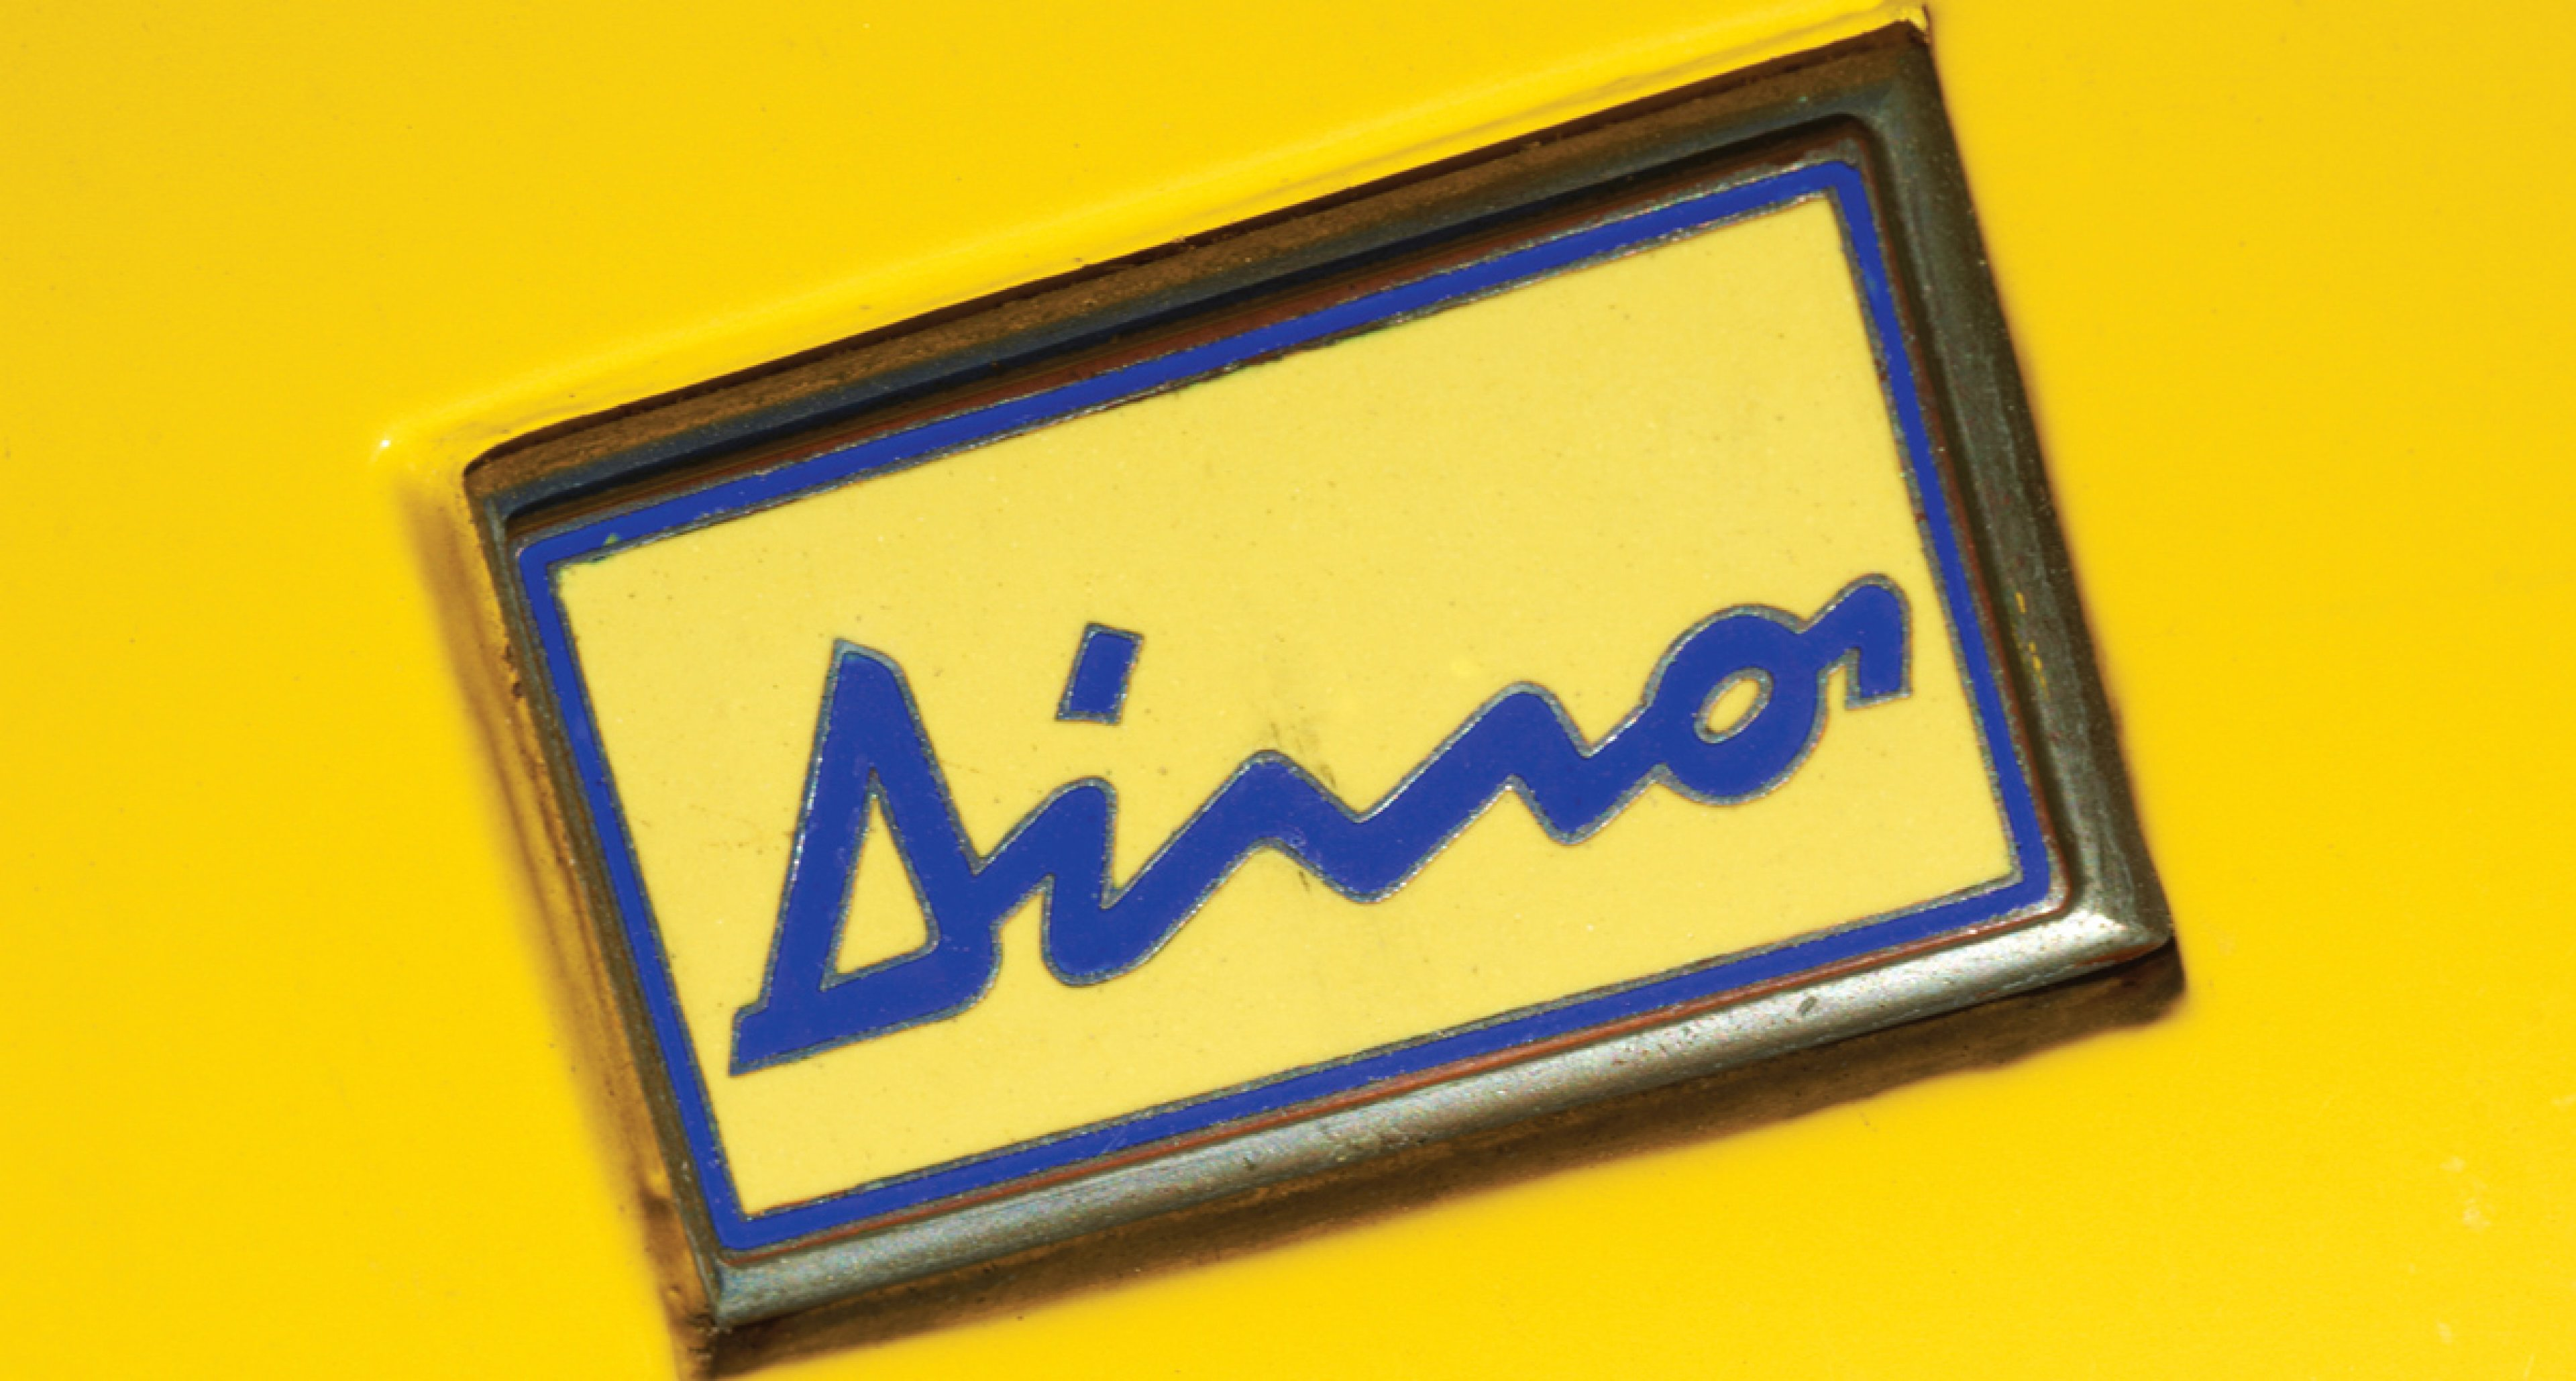 RM Auctions: 1971 Ferrari Dino 246 GT (Lot 21) / € 180.000 - 220.000